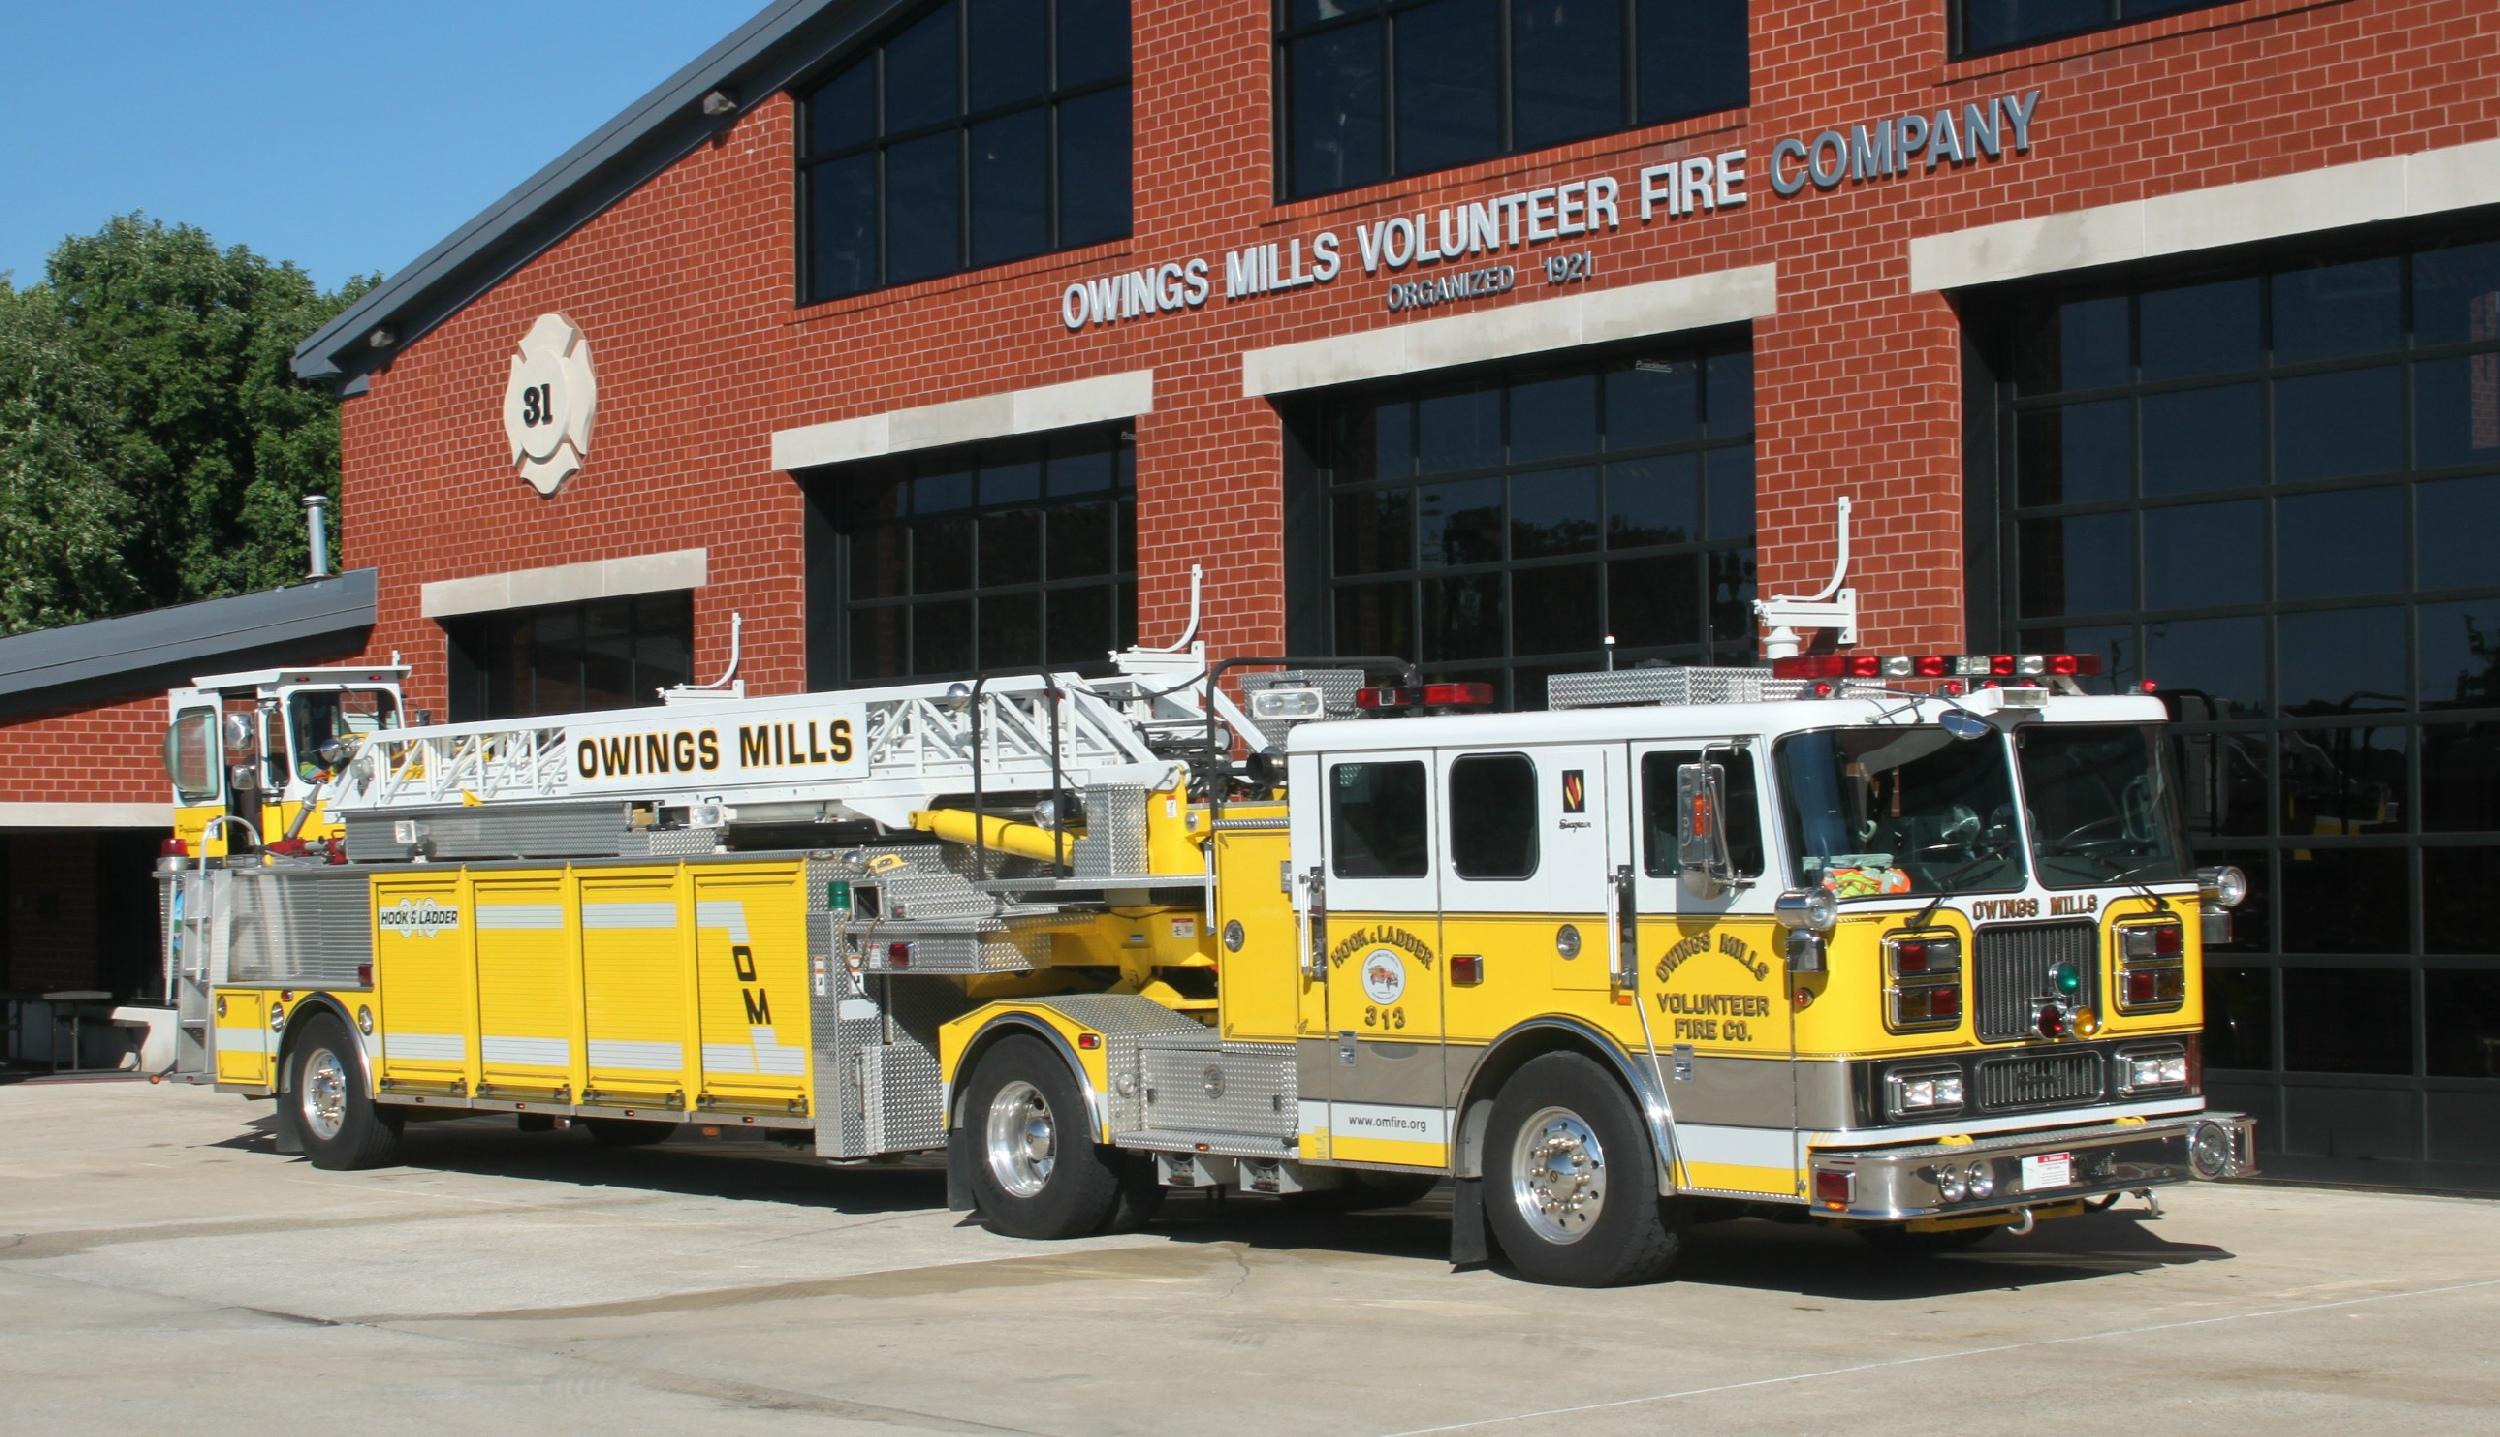 MD Owings Mills Volunteer Fire Company 31